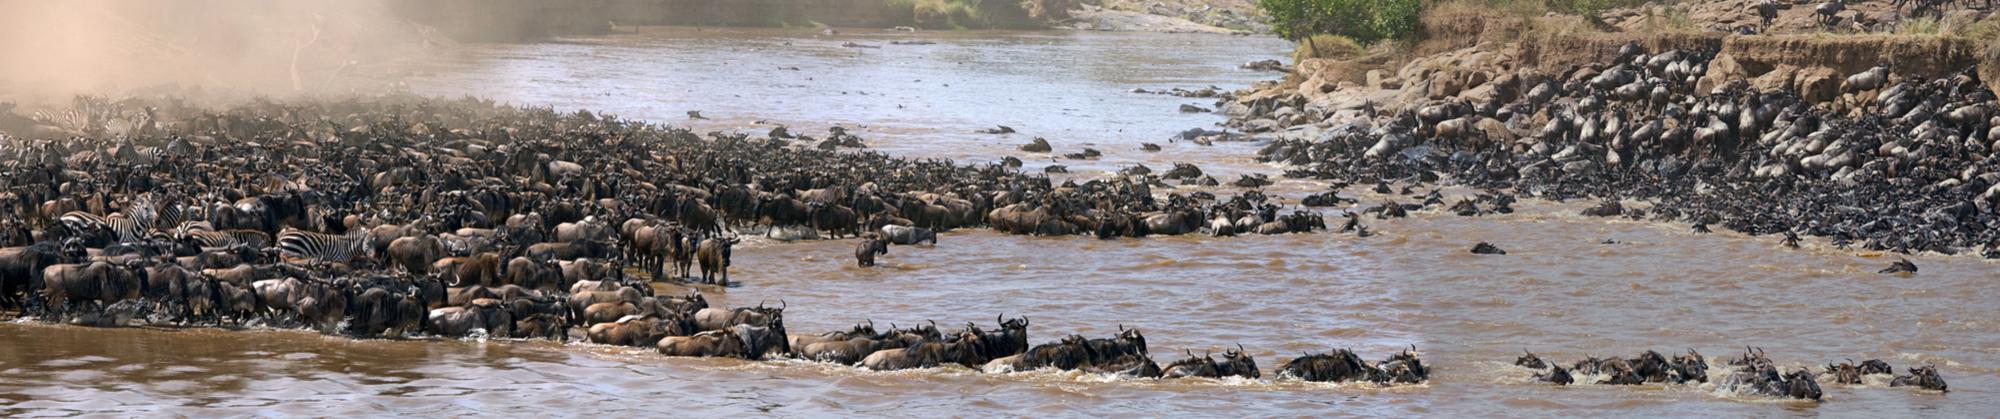 The Great Wildebeest Migration through the Serengetti